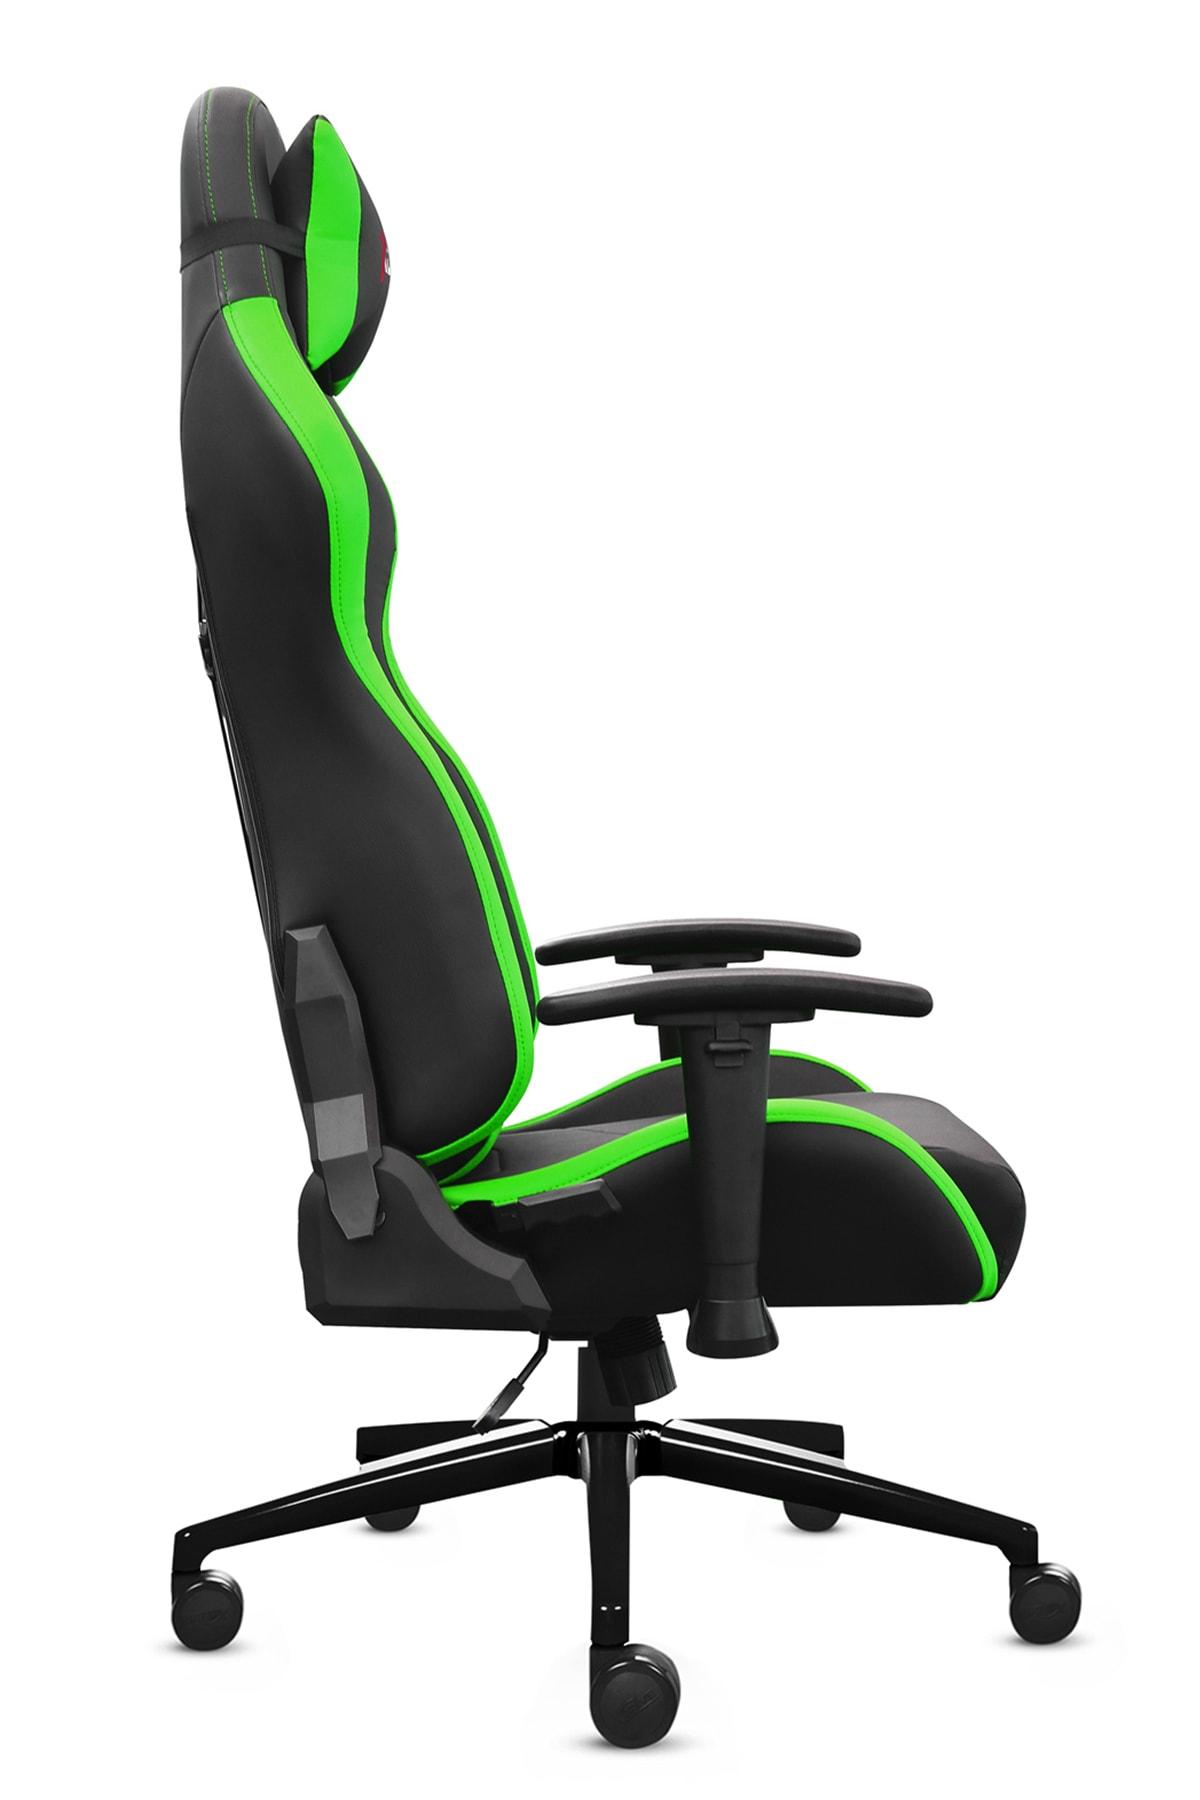 XDrive 15'Li Profesyonel Oyun   Oyuncu Koltuğu Yeşil/Siyah 2